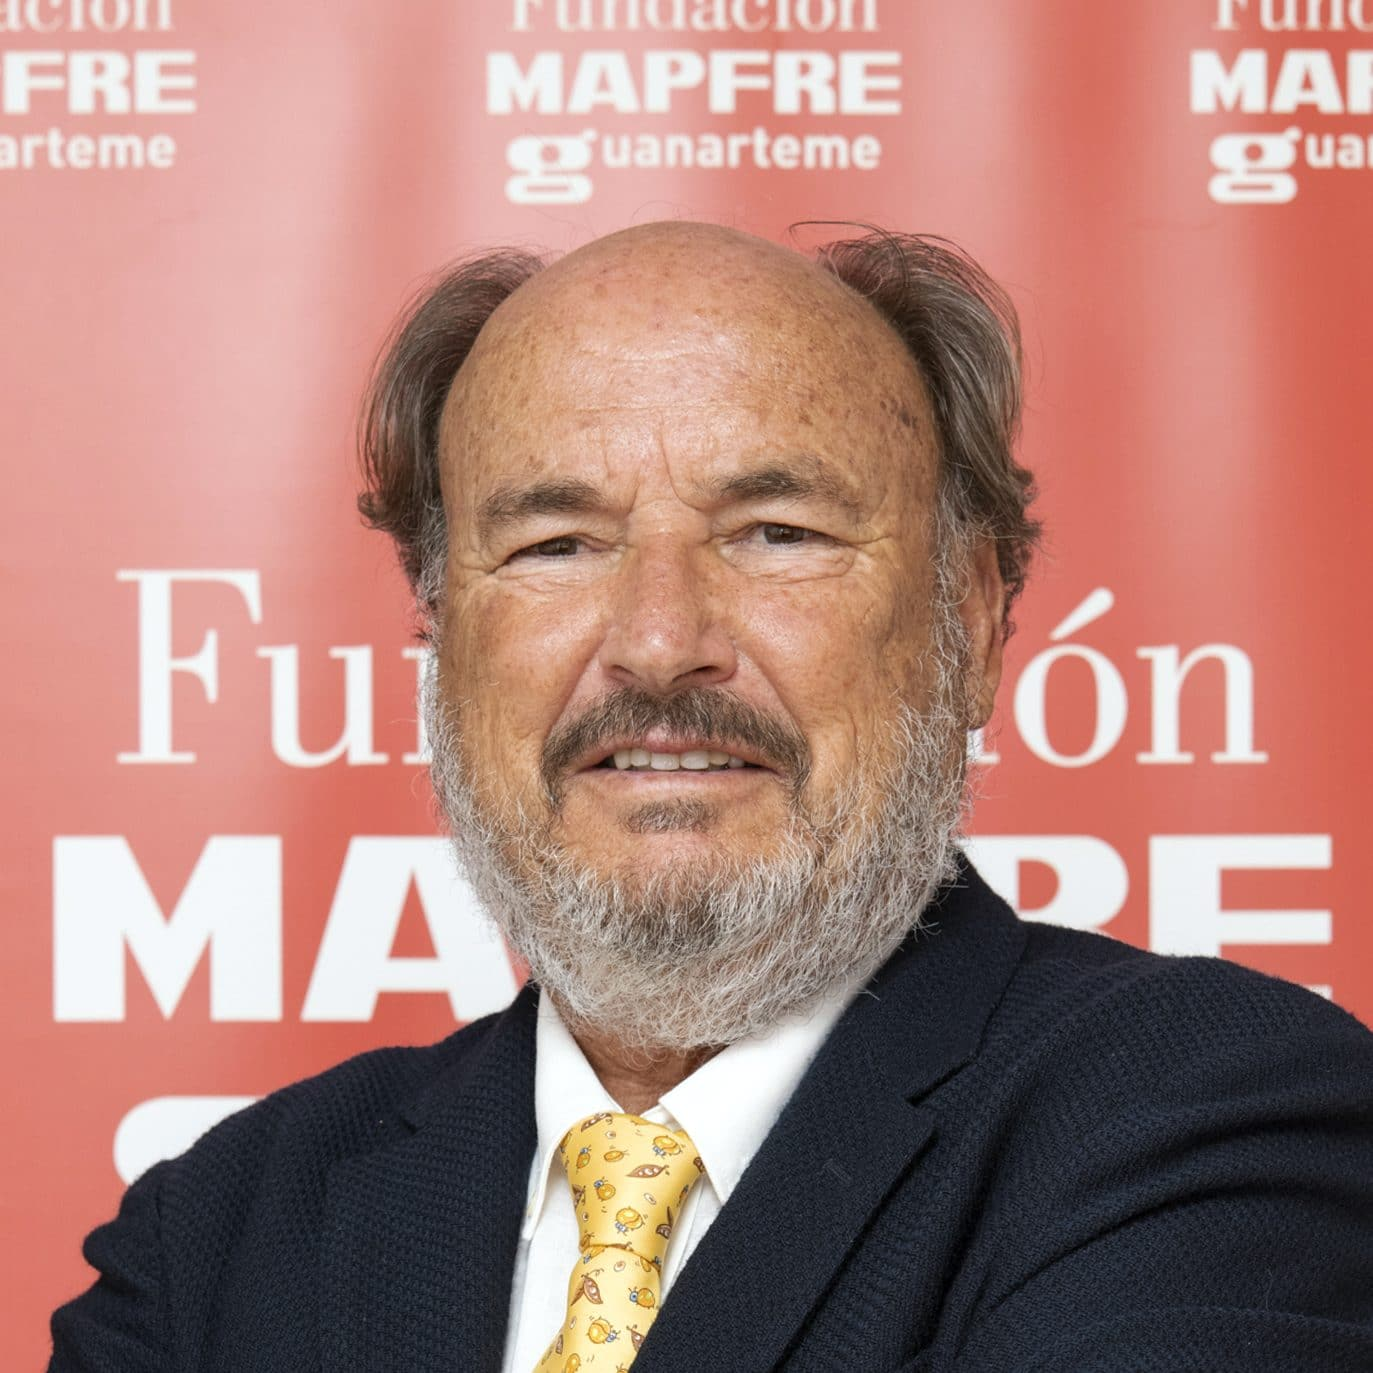 Juan Francisco Sánchez Mayor